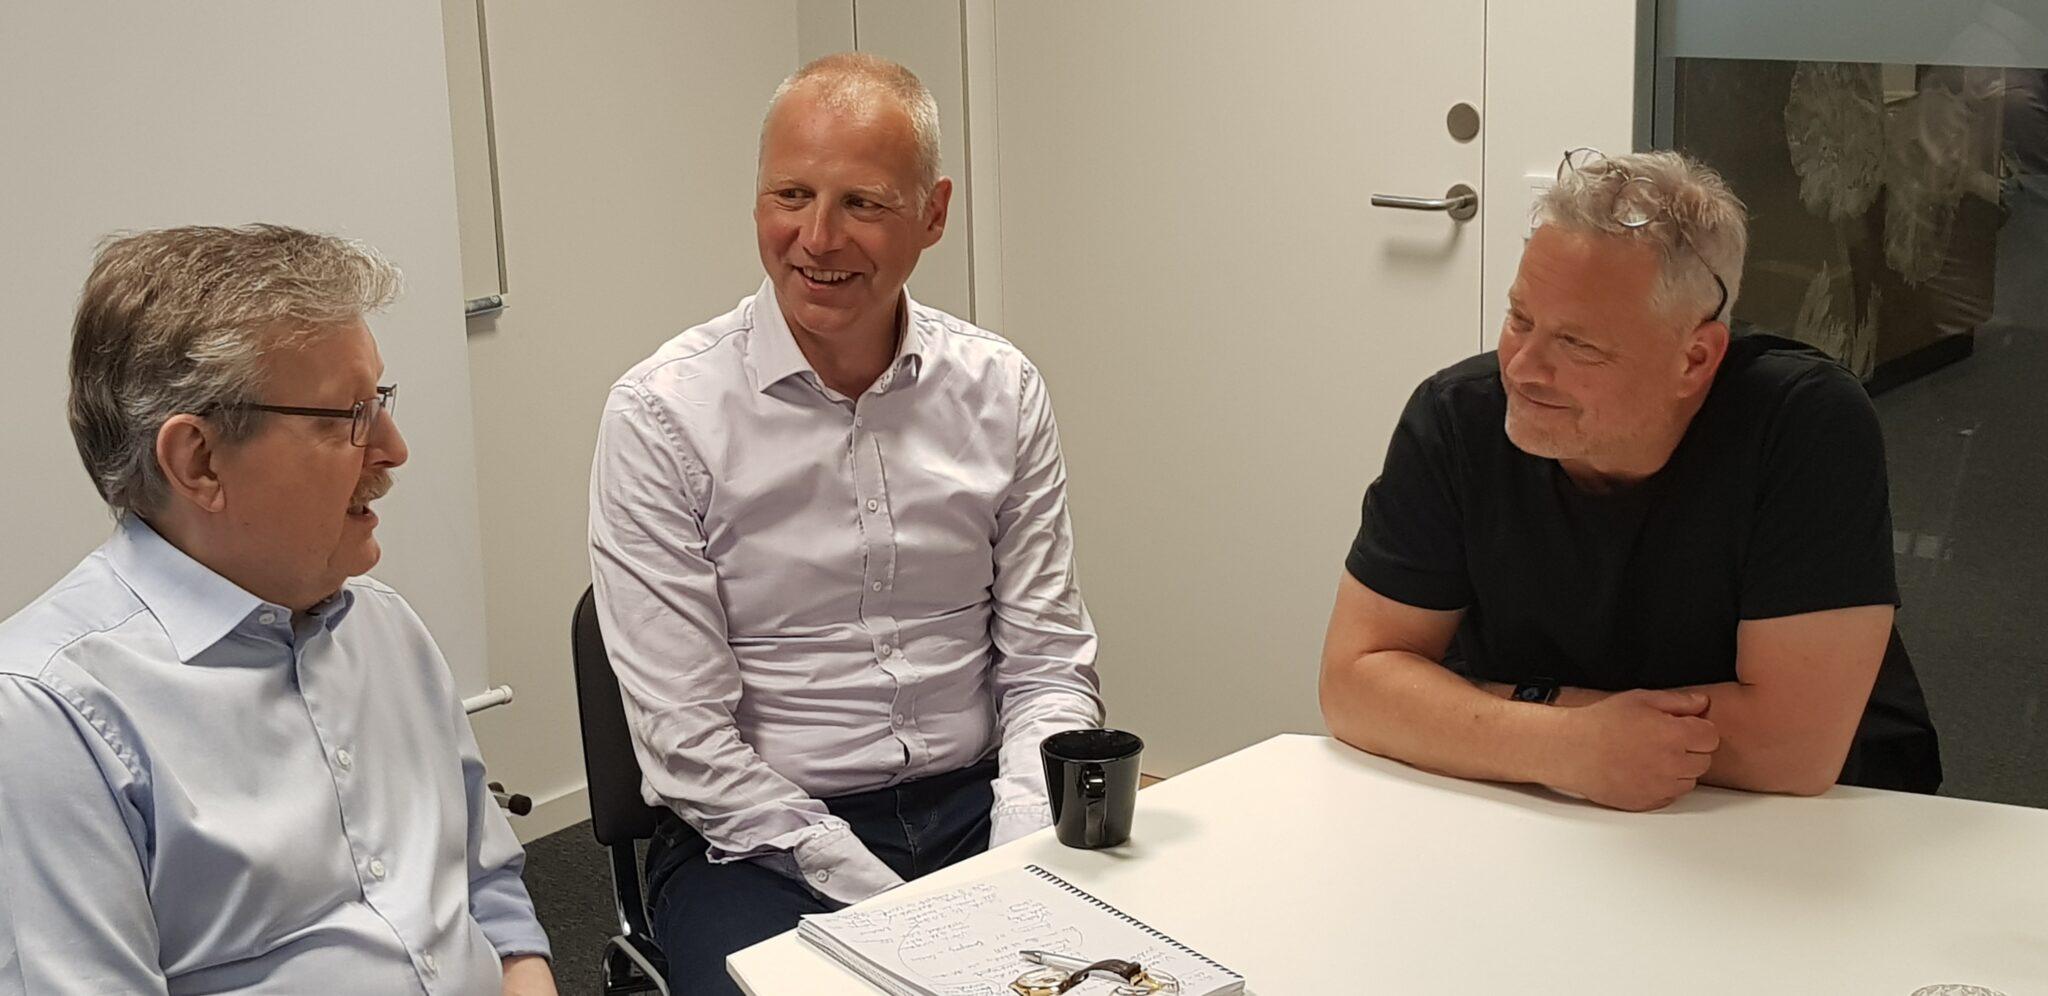 KarlErik Edris, Fredrik Lidman och Daniel Lundqvist under inspelningen av avsnitt 5.